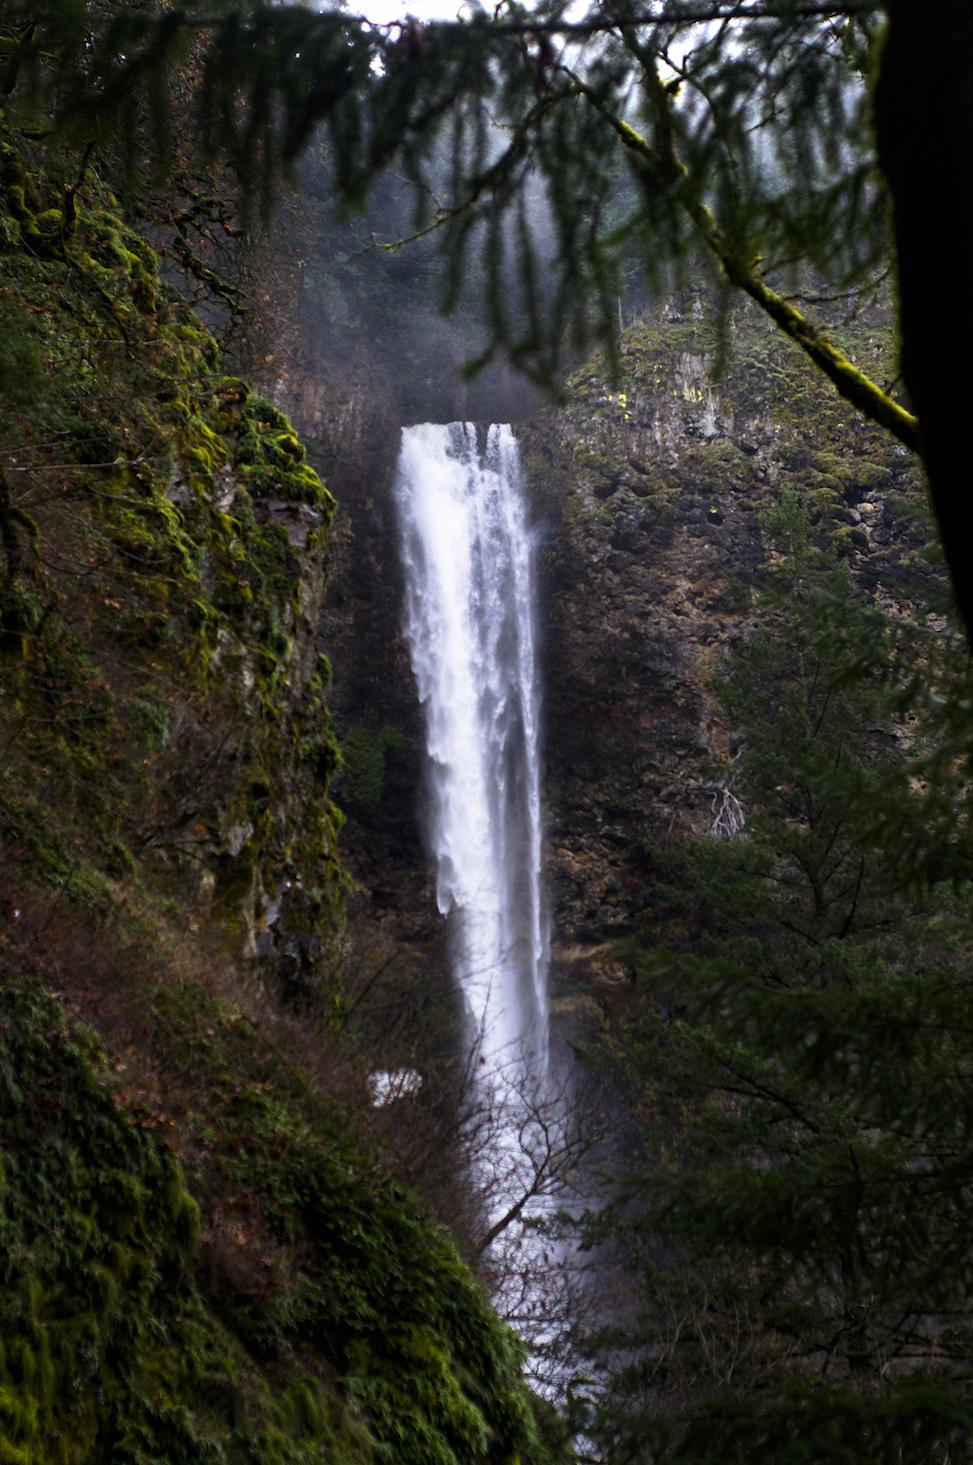 Bridal Veil, multnomah falls, oregon